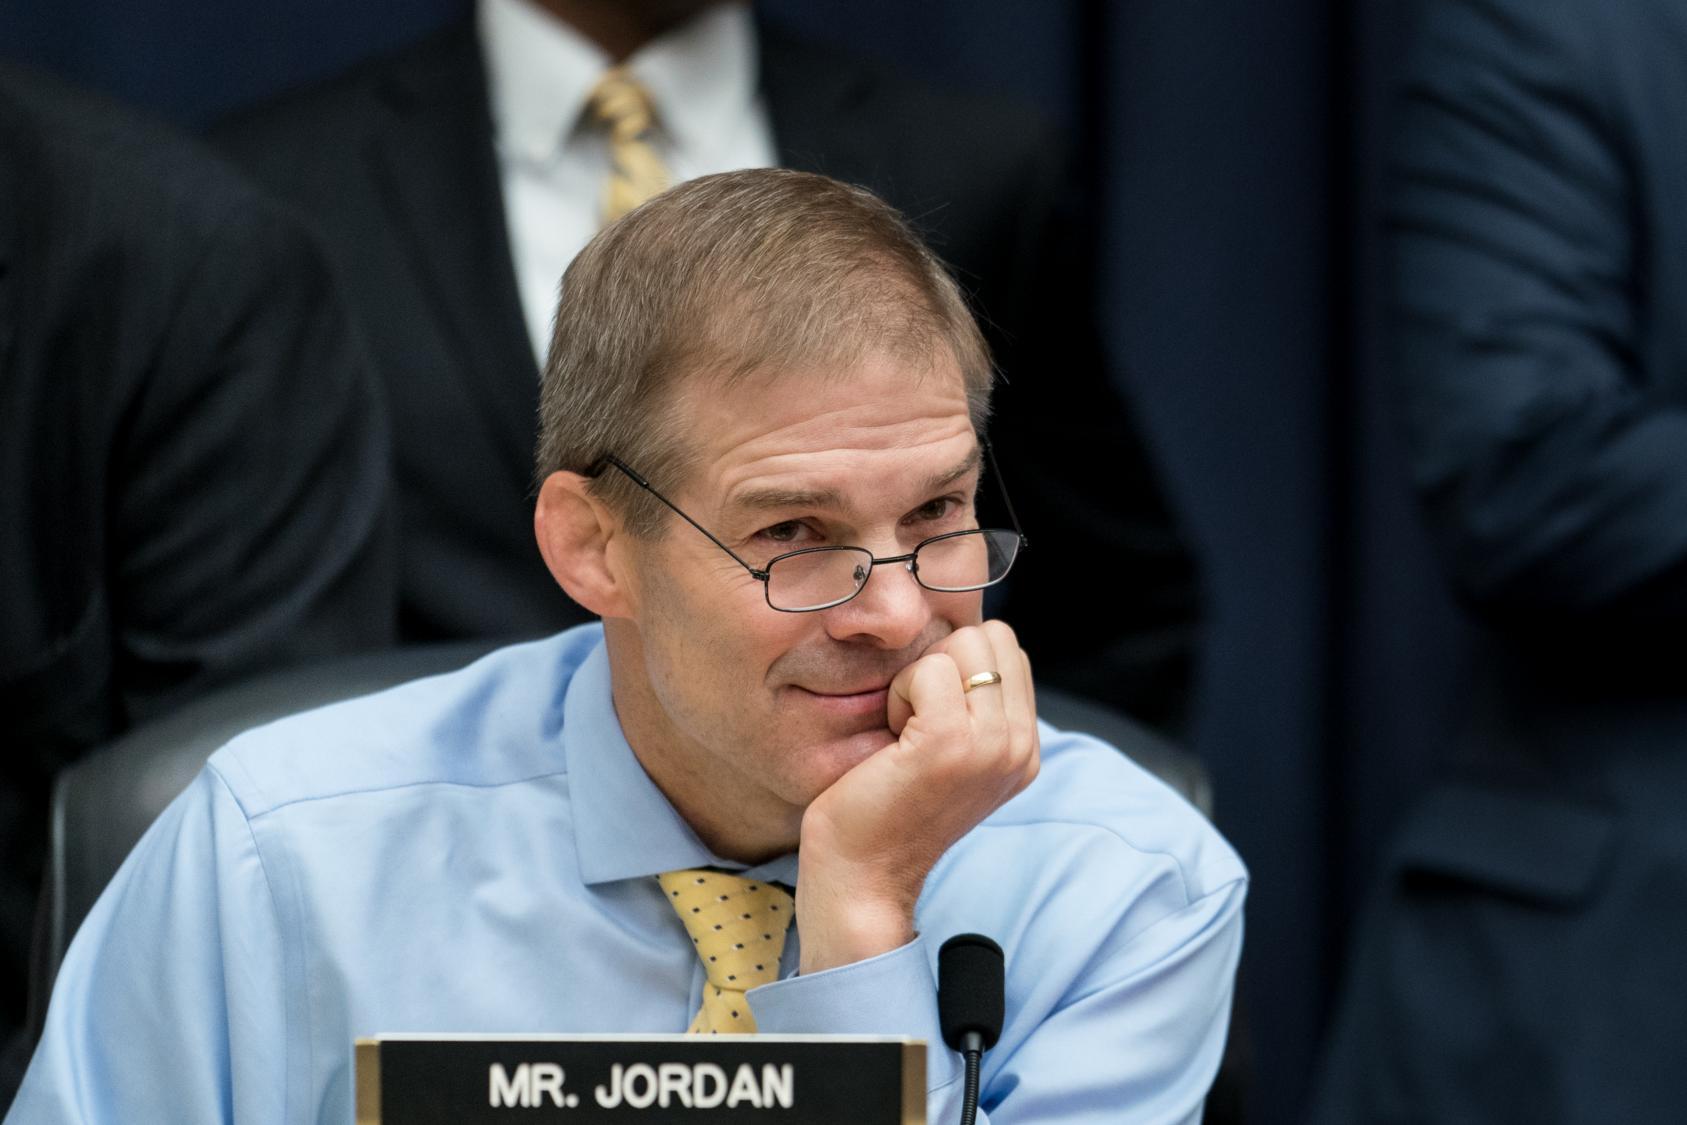 Jim Jordan, Embattled Conservative, Says He Will Run for House